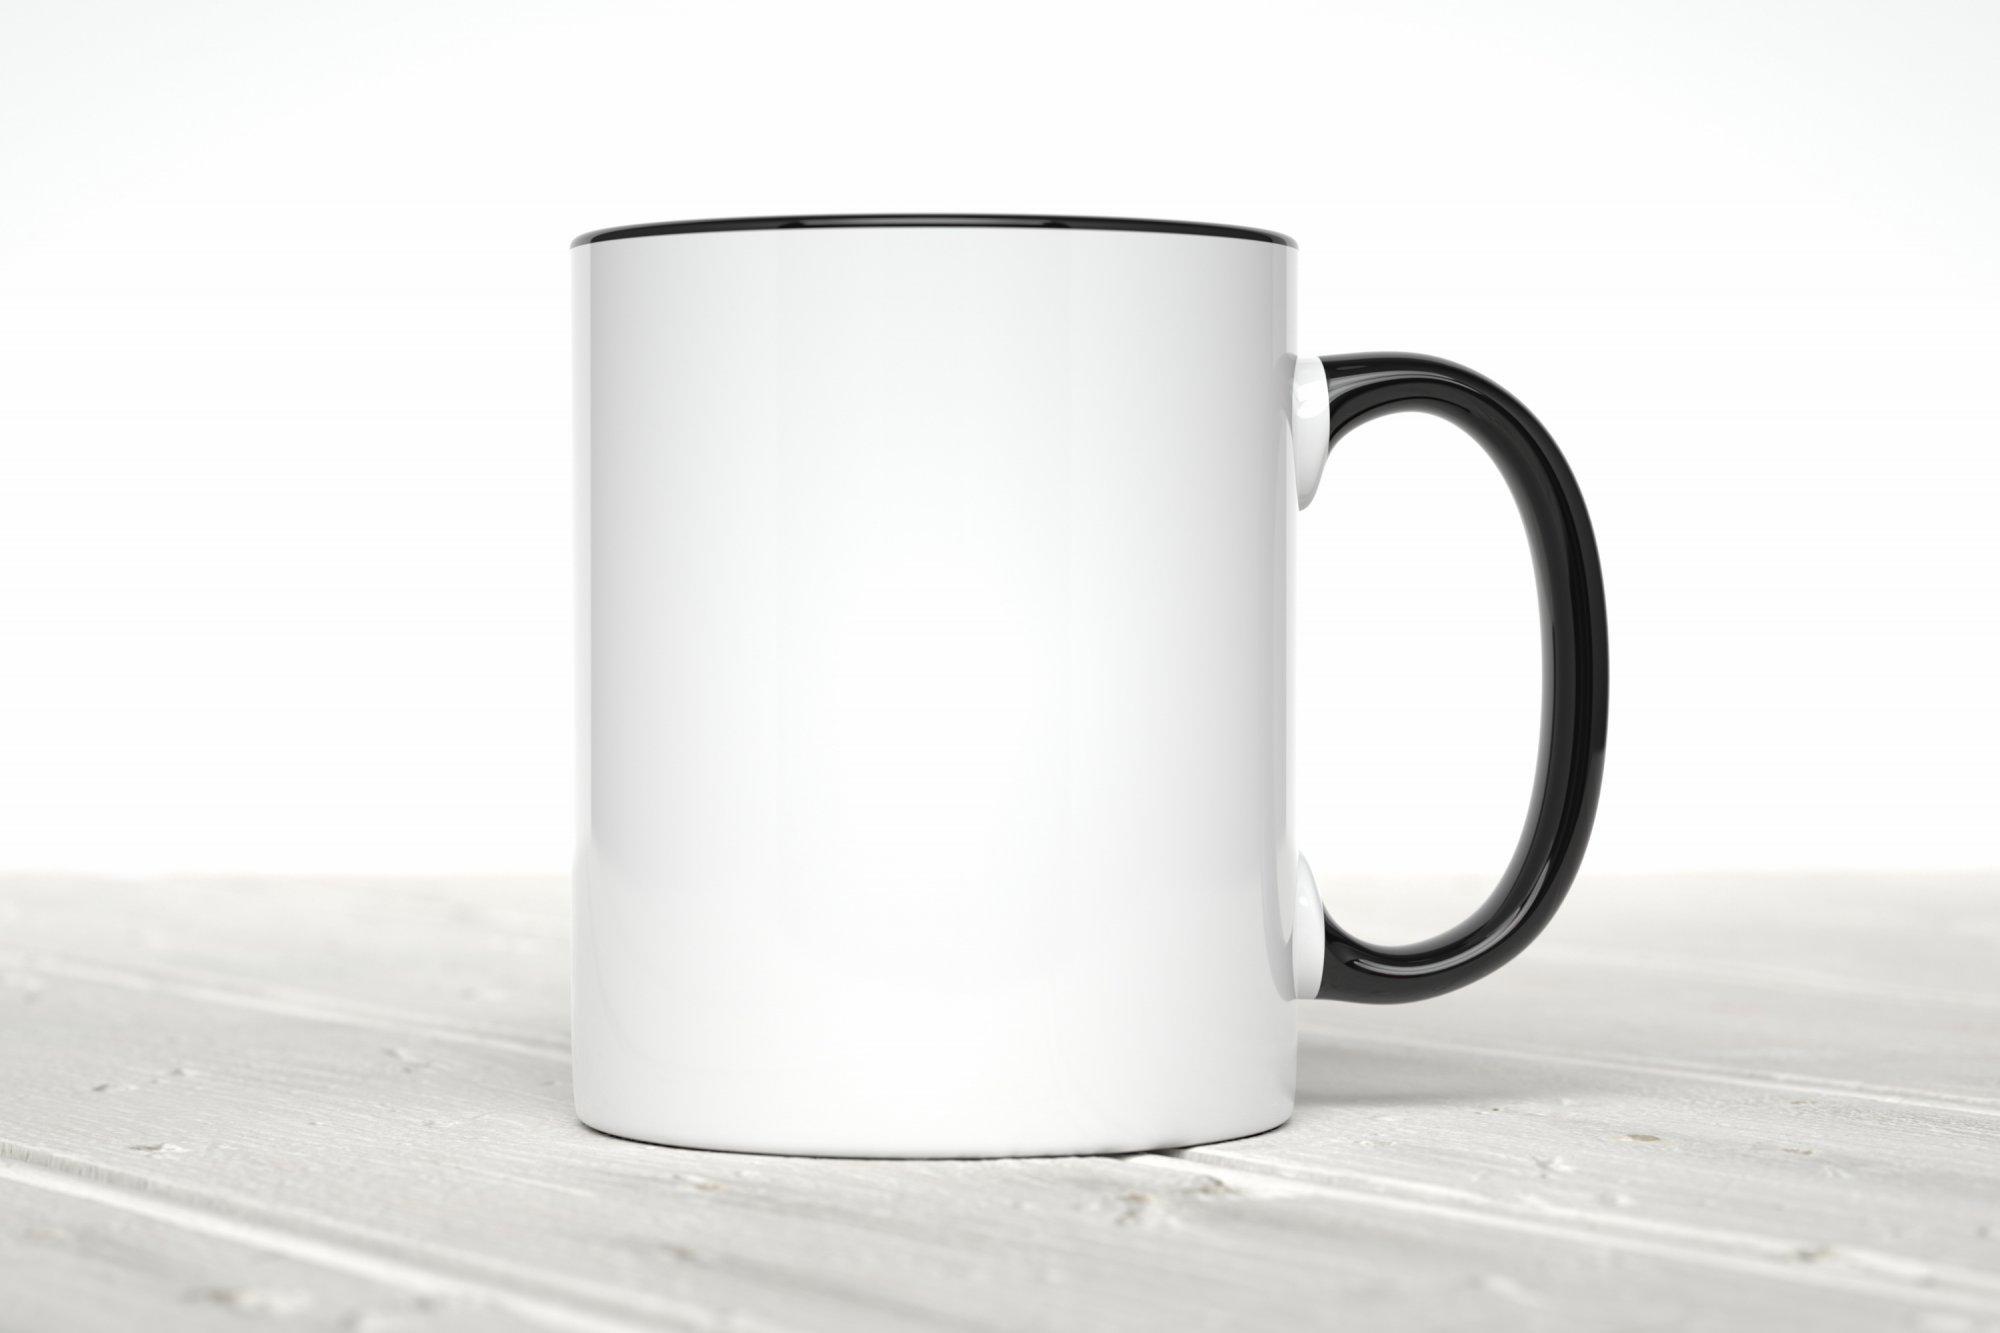 Personalized White Coffee Mug with black handle/inside, 11 oz.